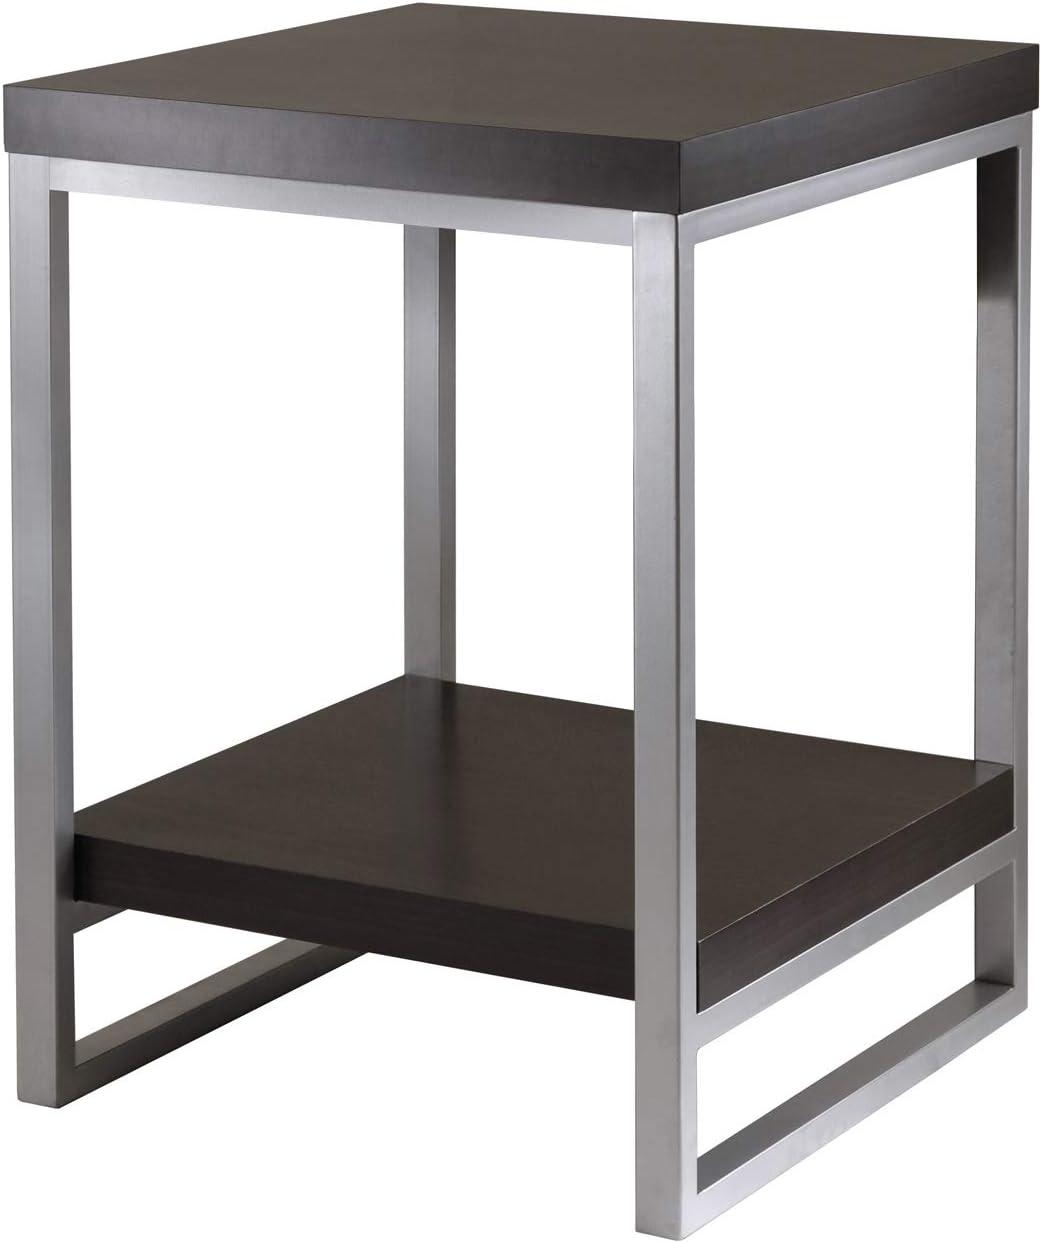 Winsome Wood Jared End Table, Espresso Finish: Furniture & Decor